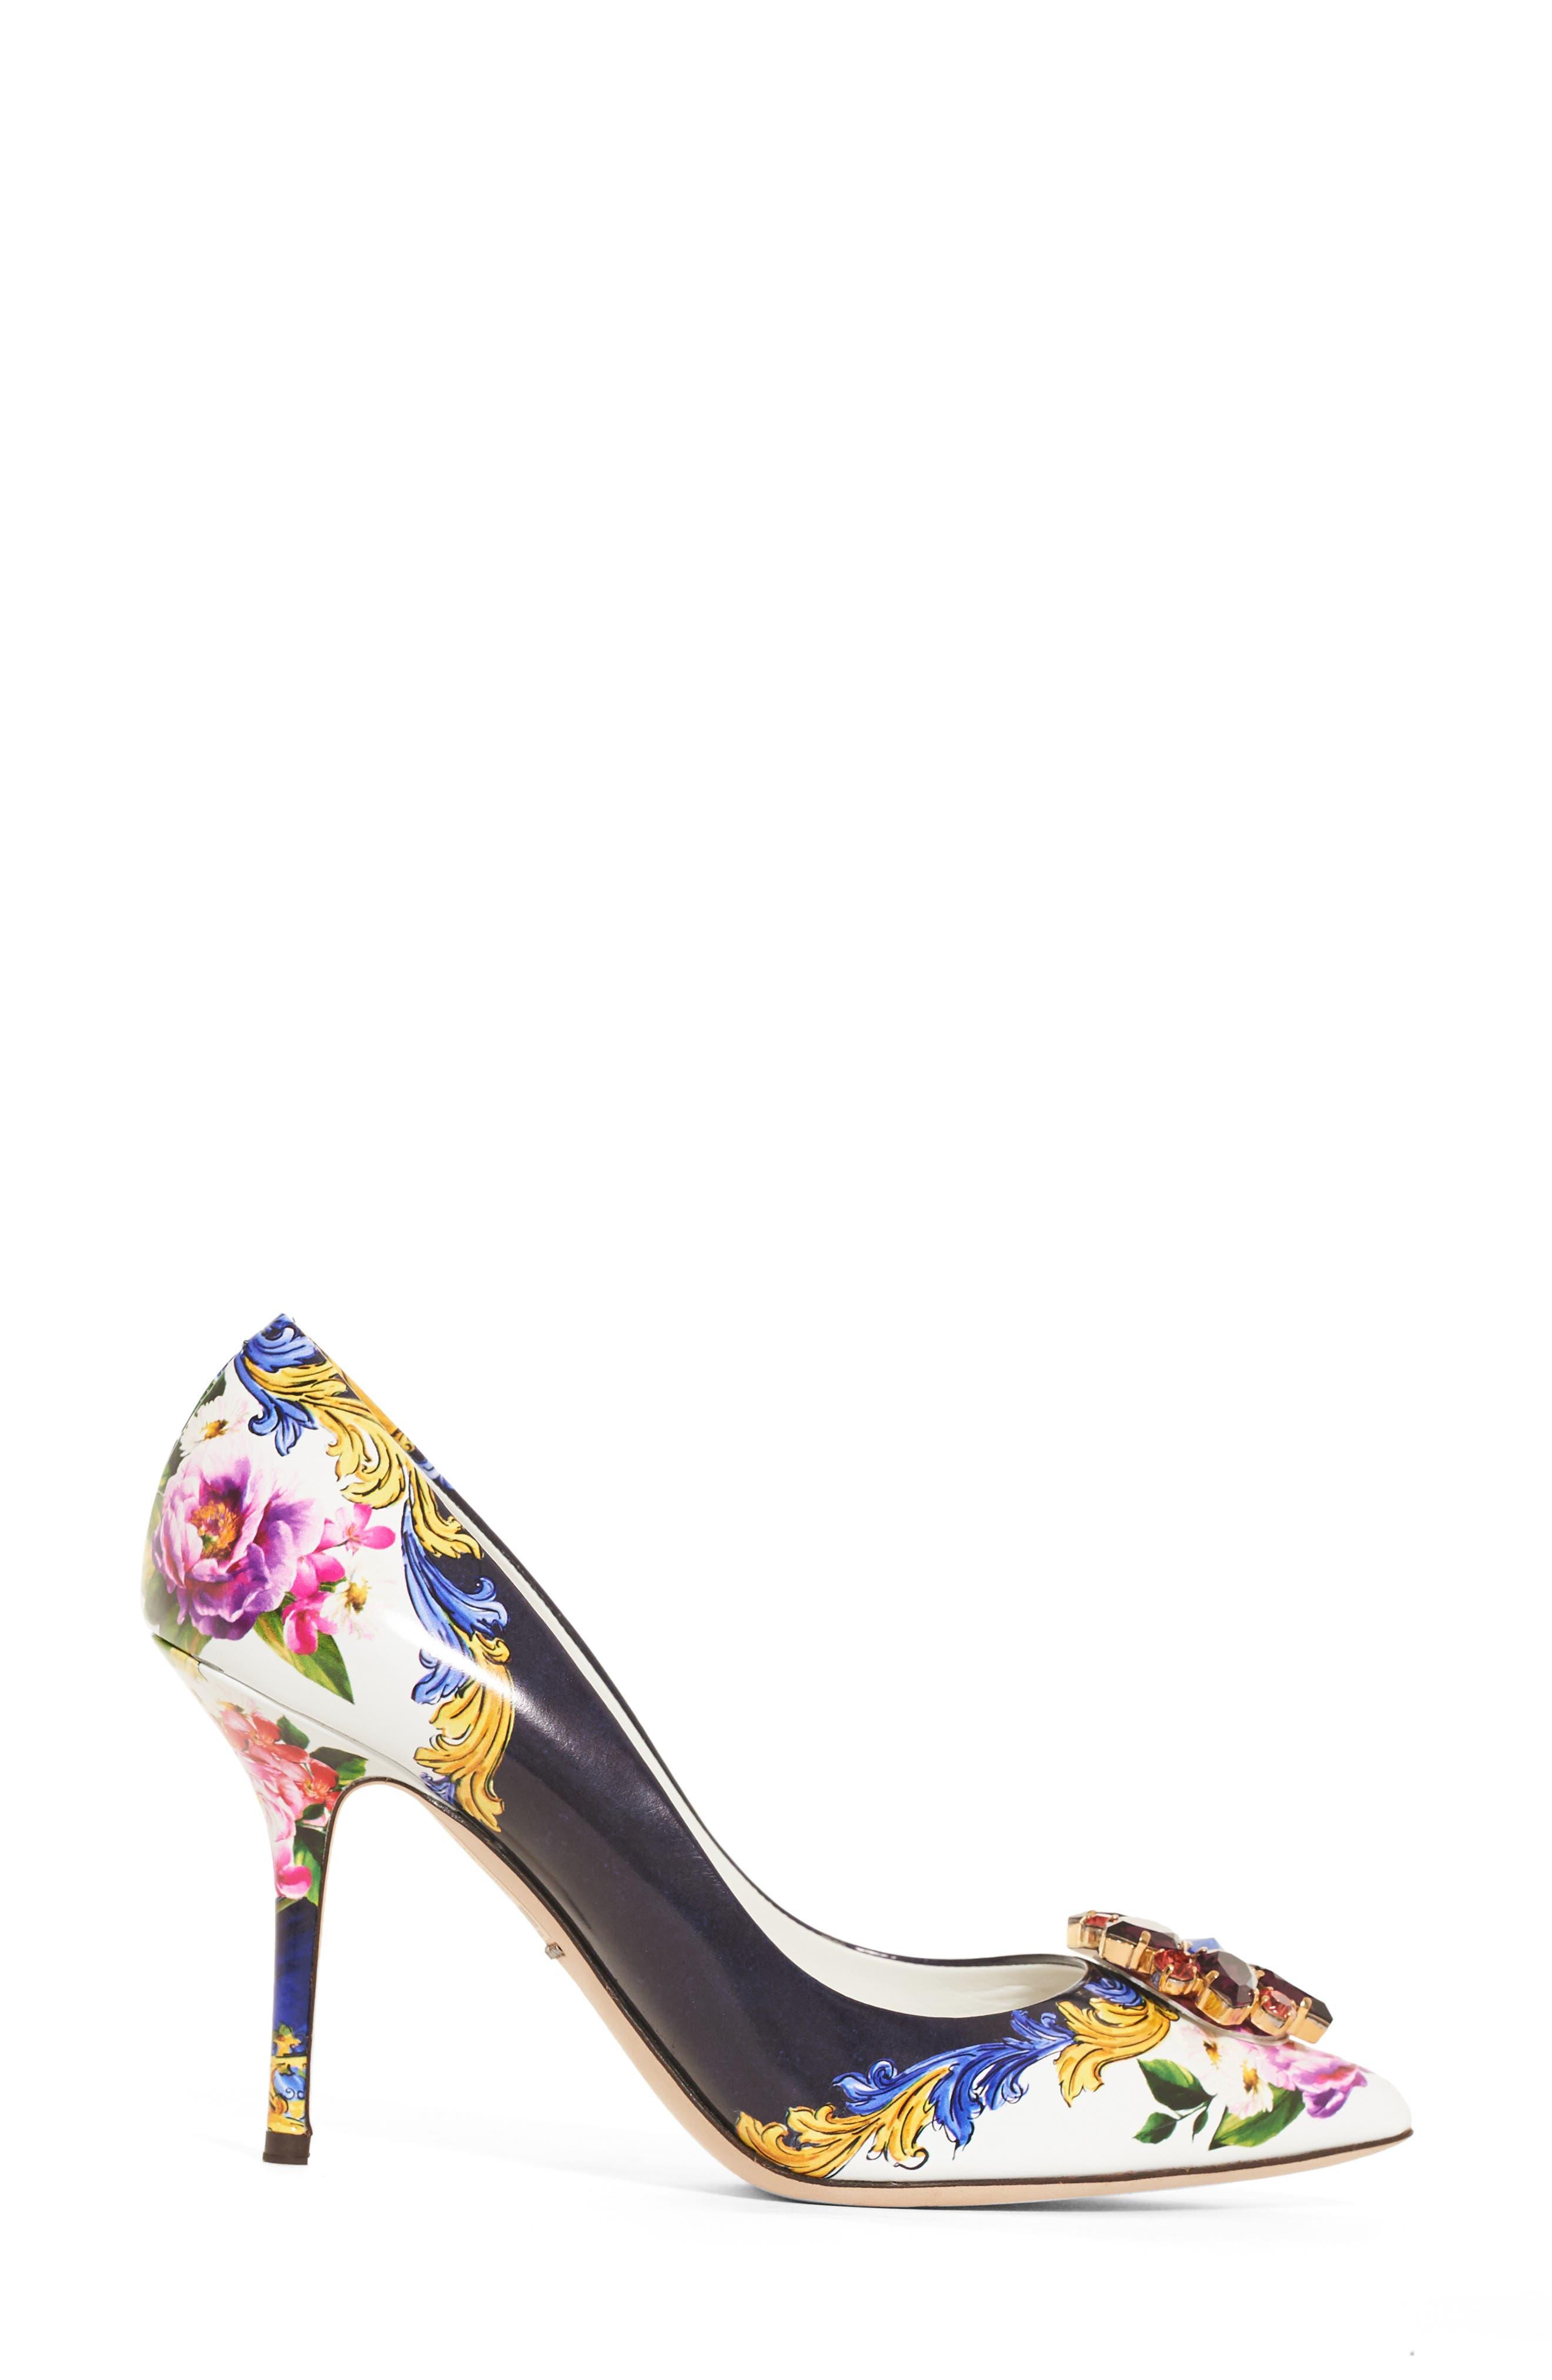 Dolce & Gabbana Print Pump,                             Alternate thumbnail 4, color,                             Navy/ White Floral